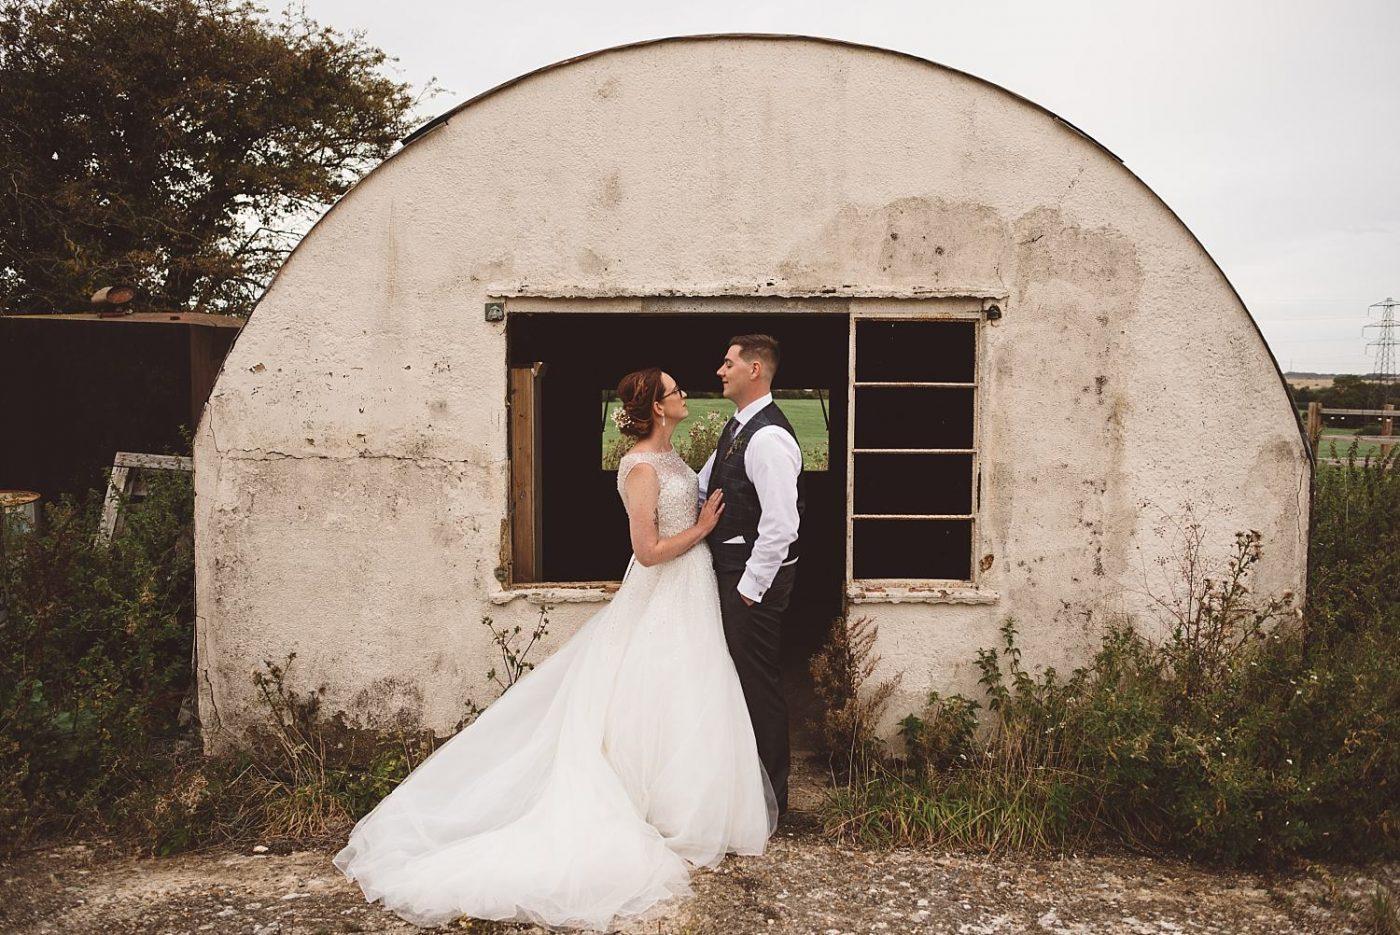 bride and groom rustic wedding portrait at Milling barn